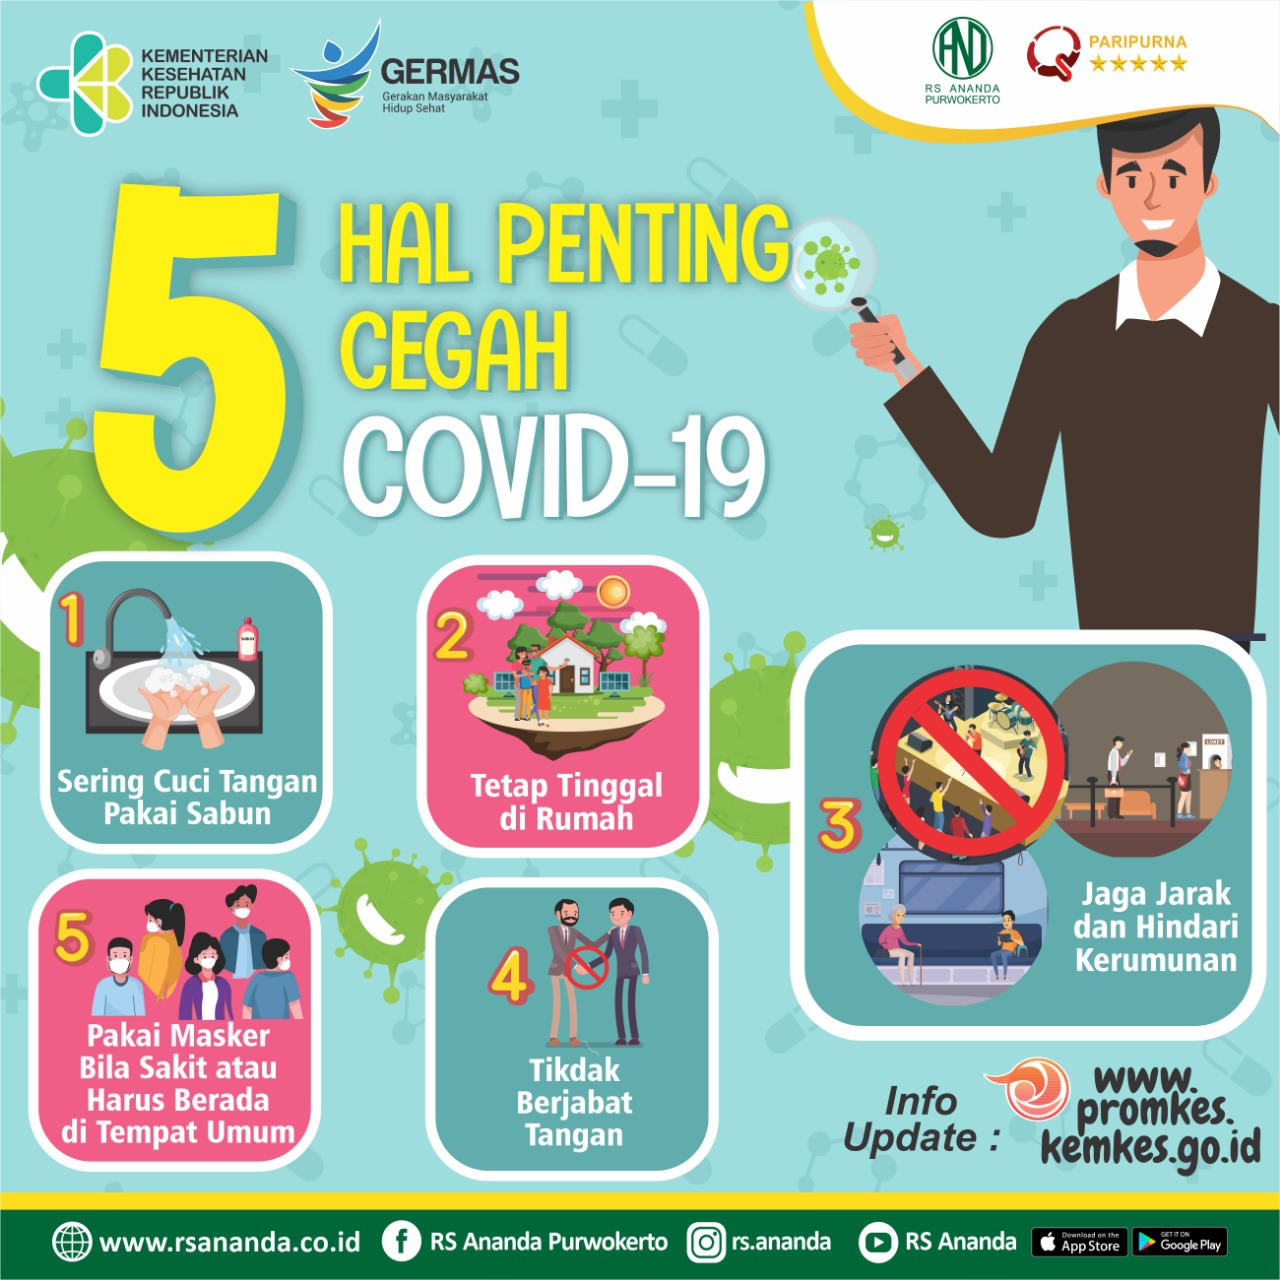 covid-19 COVID-19 WhatsApp Image 2020 03 27 at 00